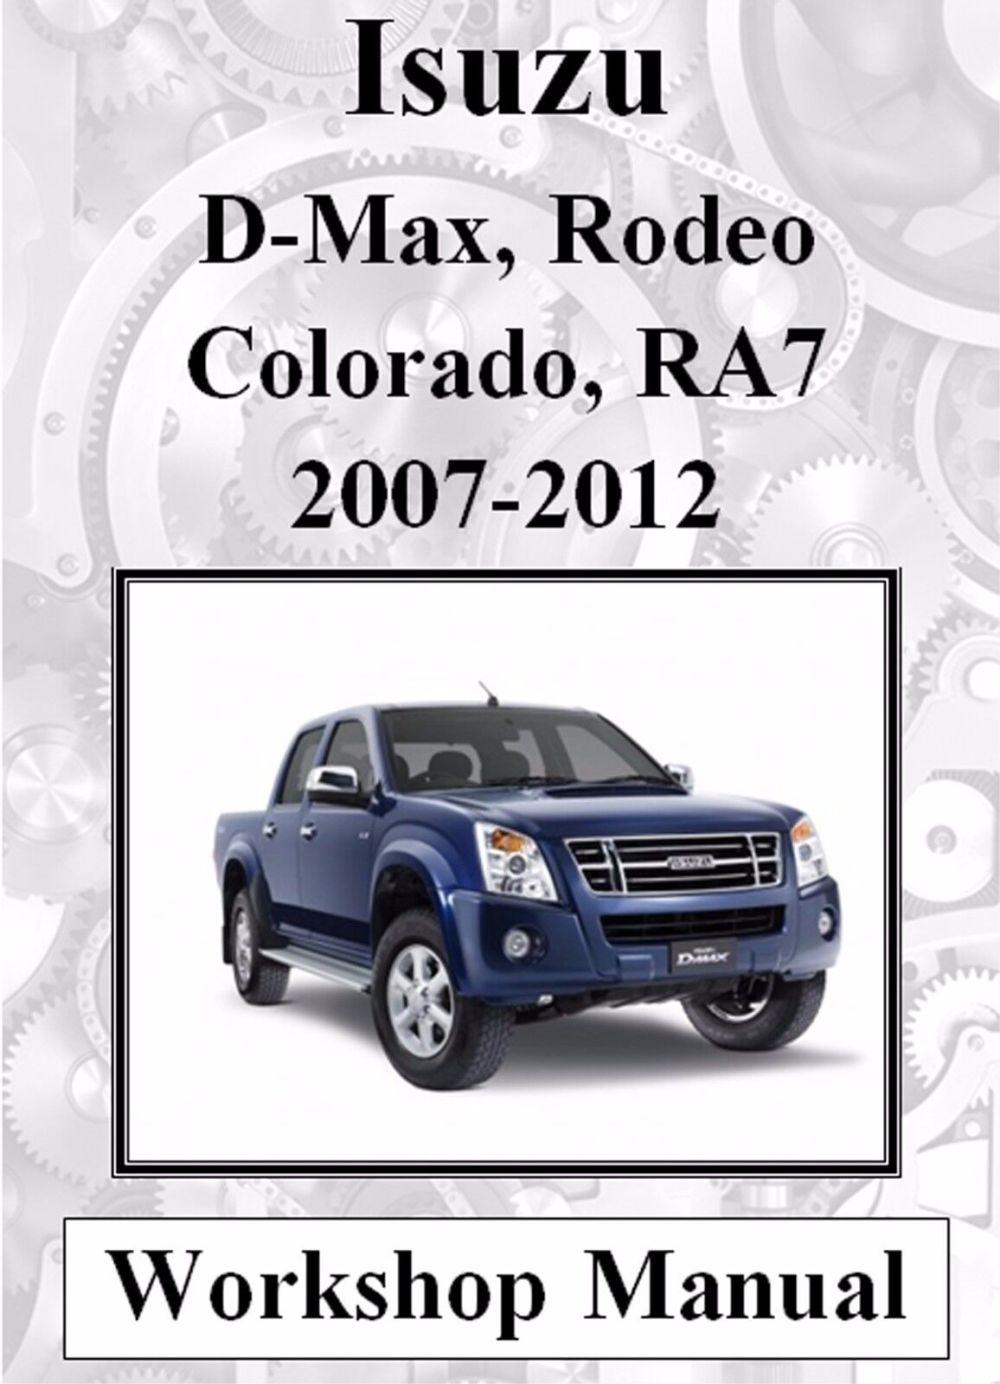 medium resolution of isuzu d max rodeo holden colorado ra7 2007 2012 workshop manual digital download ebay